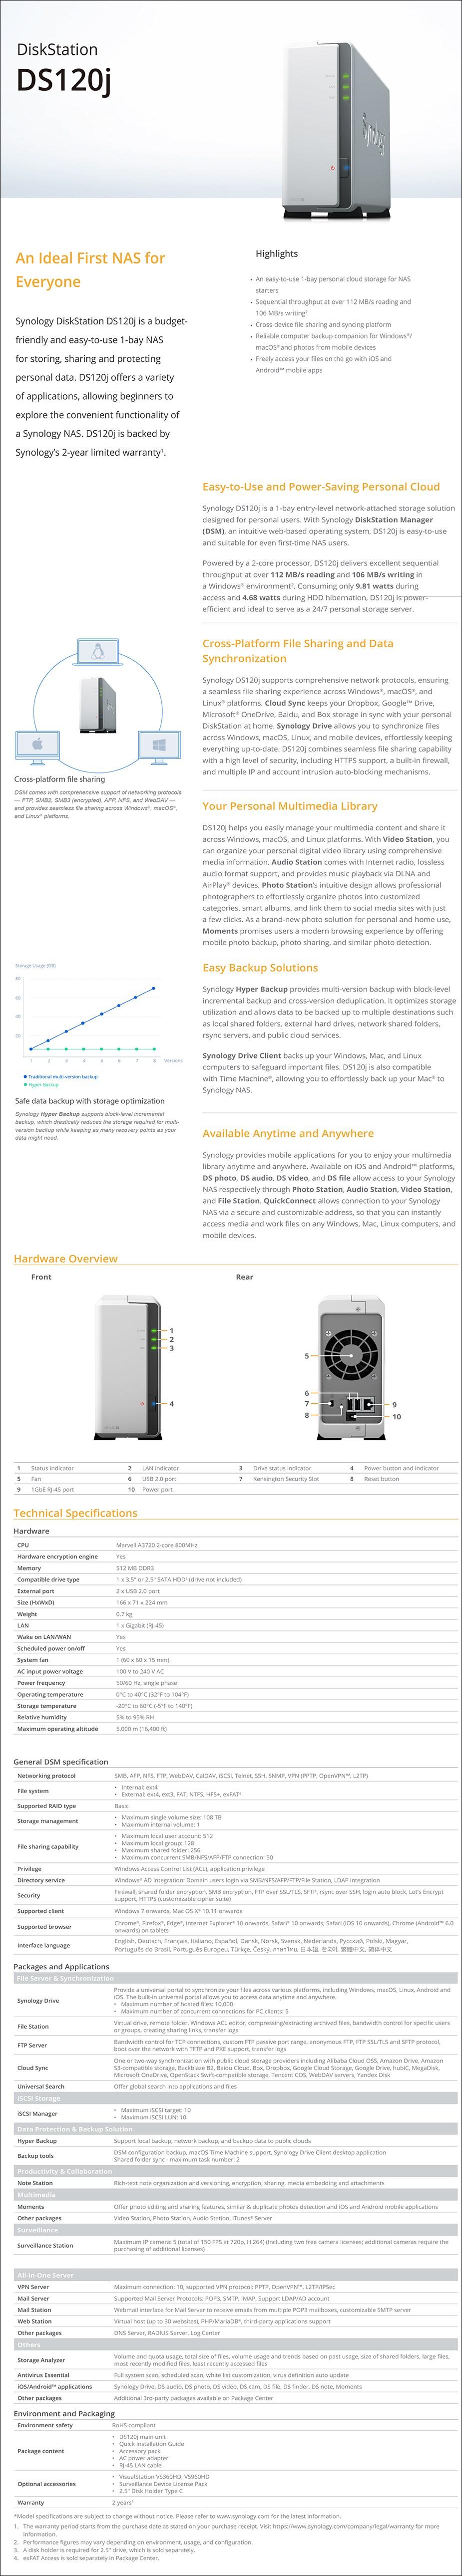 synology-diskstation-ds120j-1bay-diskless-nas-dual-core-cpu-512mb-ram-ac28836-4.jpg